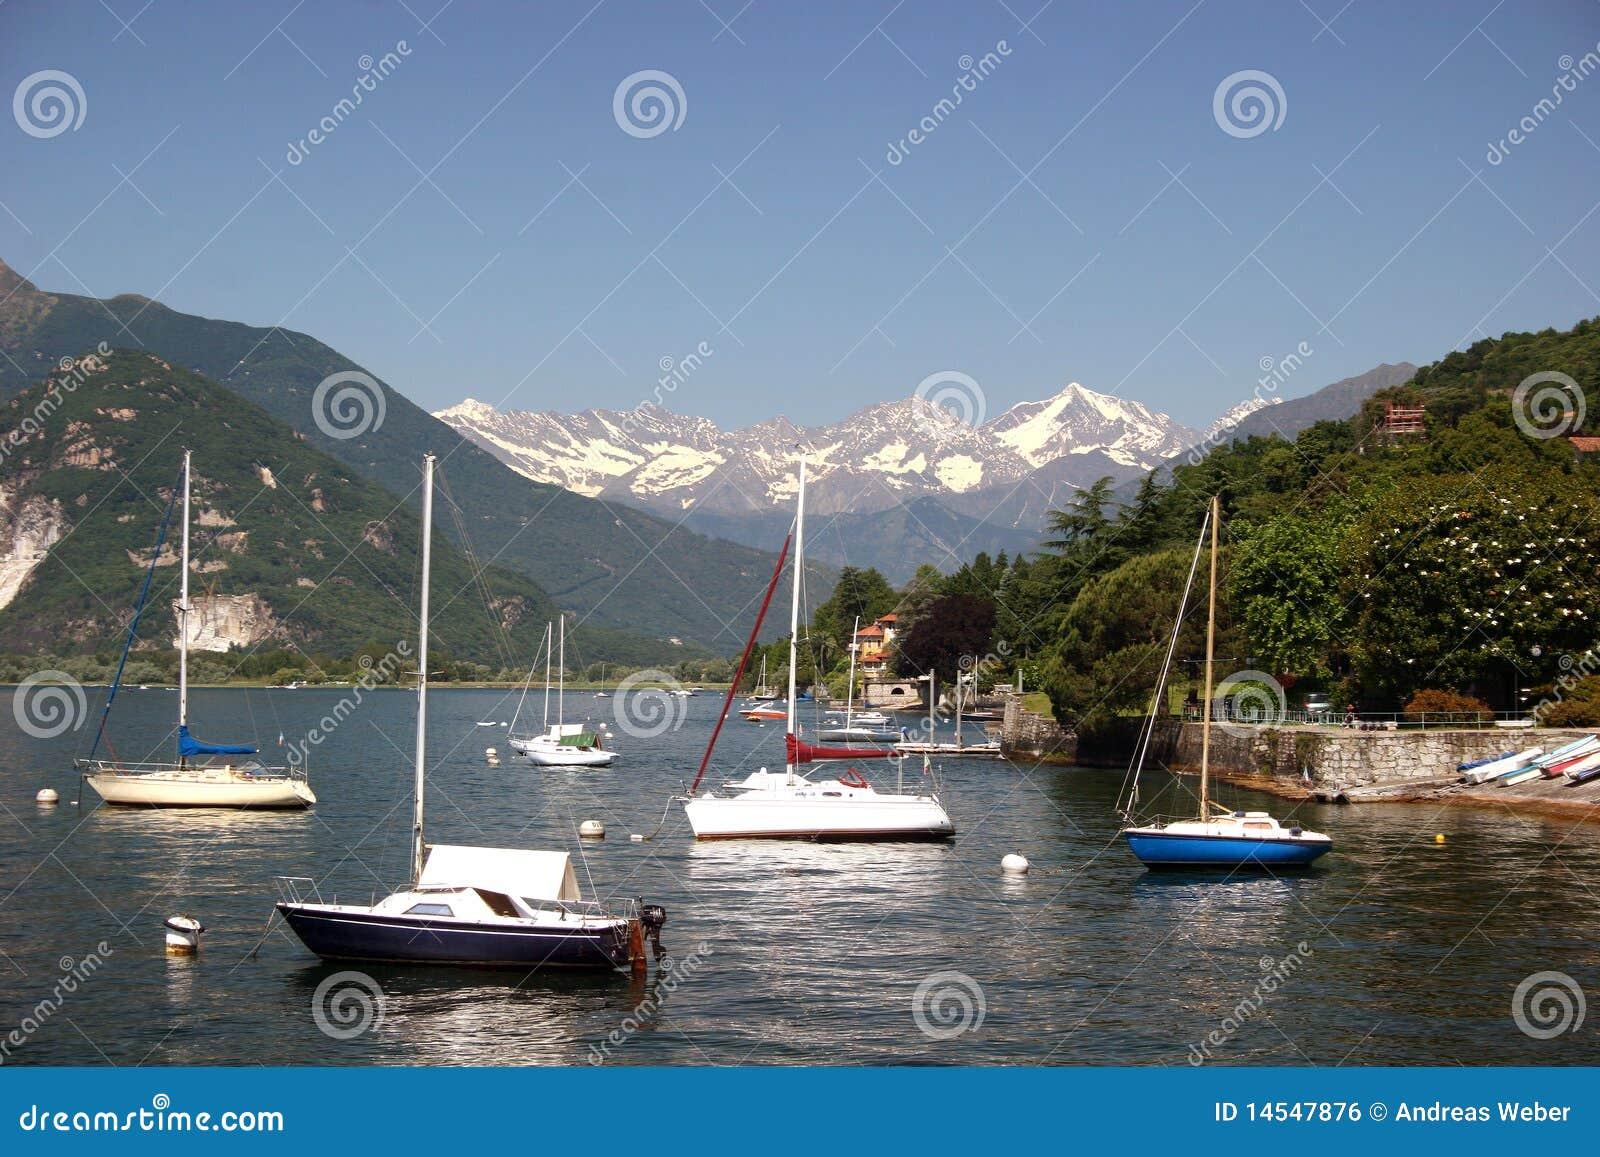 Snowcapped Imágenes De Stock Snowcapped Fotos De Stock: Lago Maggiore And Snowcapped Swiss Alps Royalty Free Stock